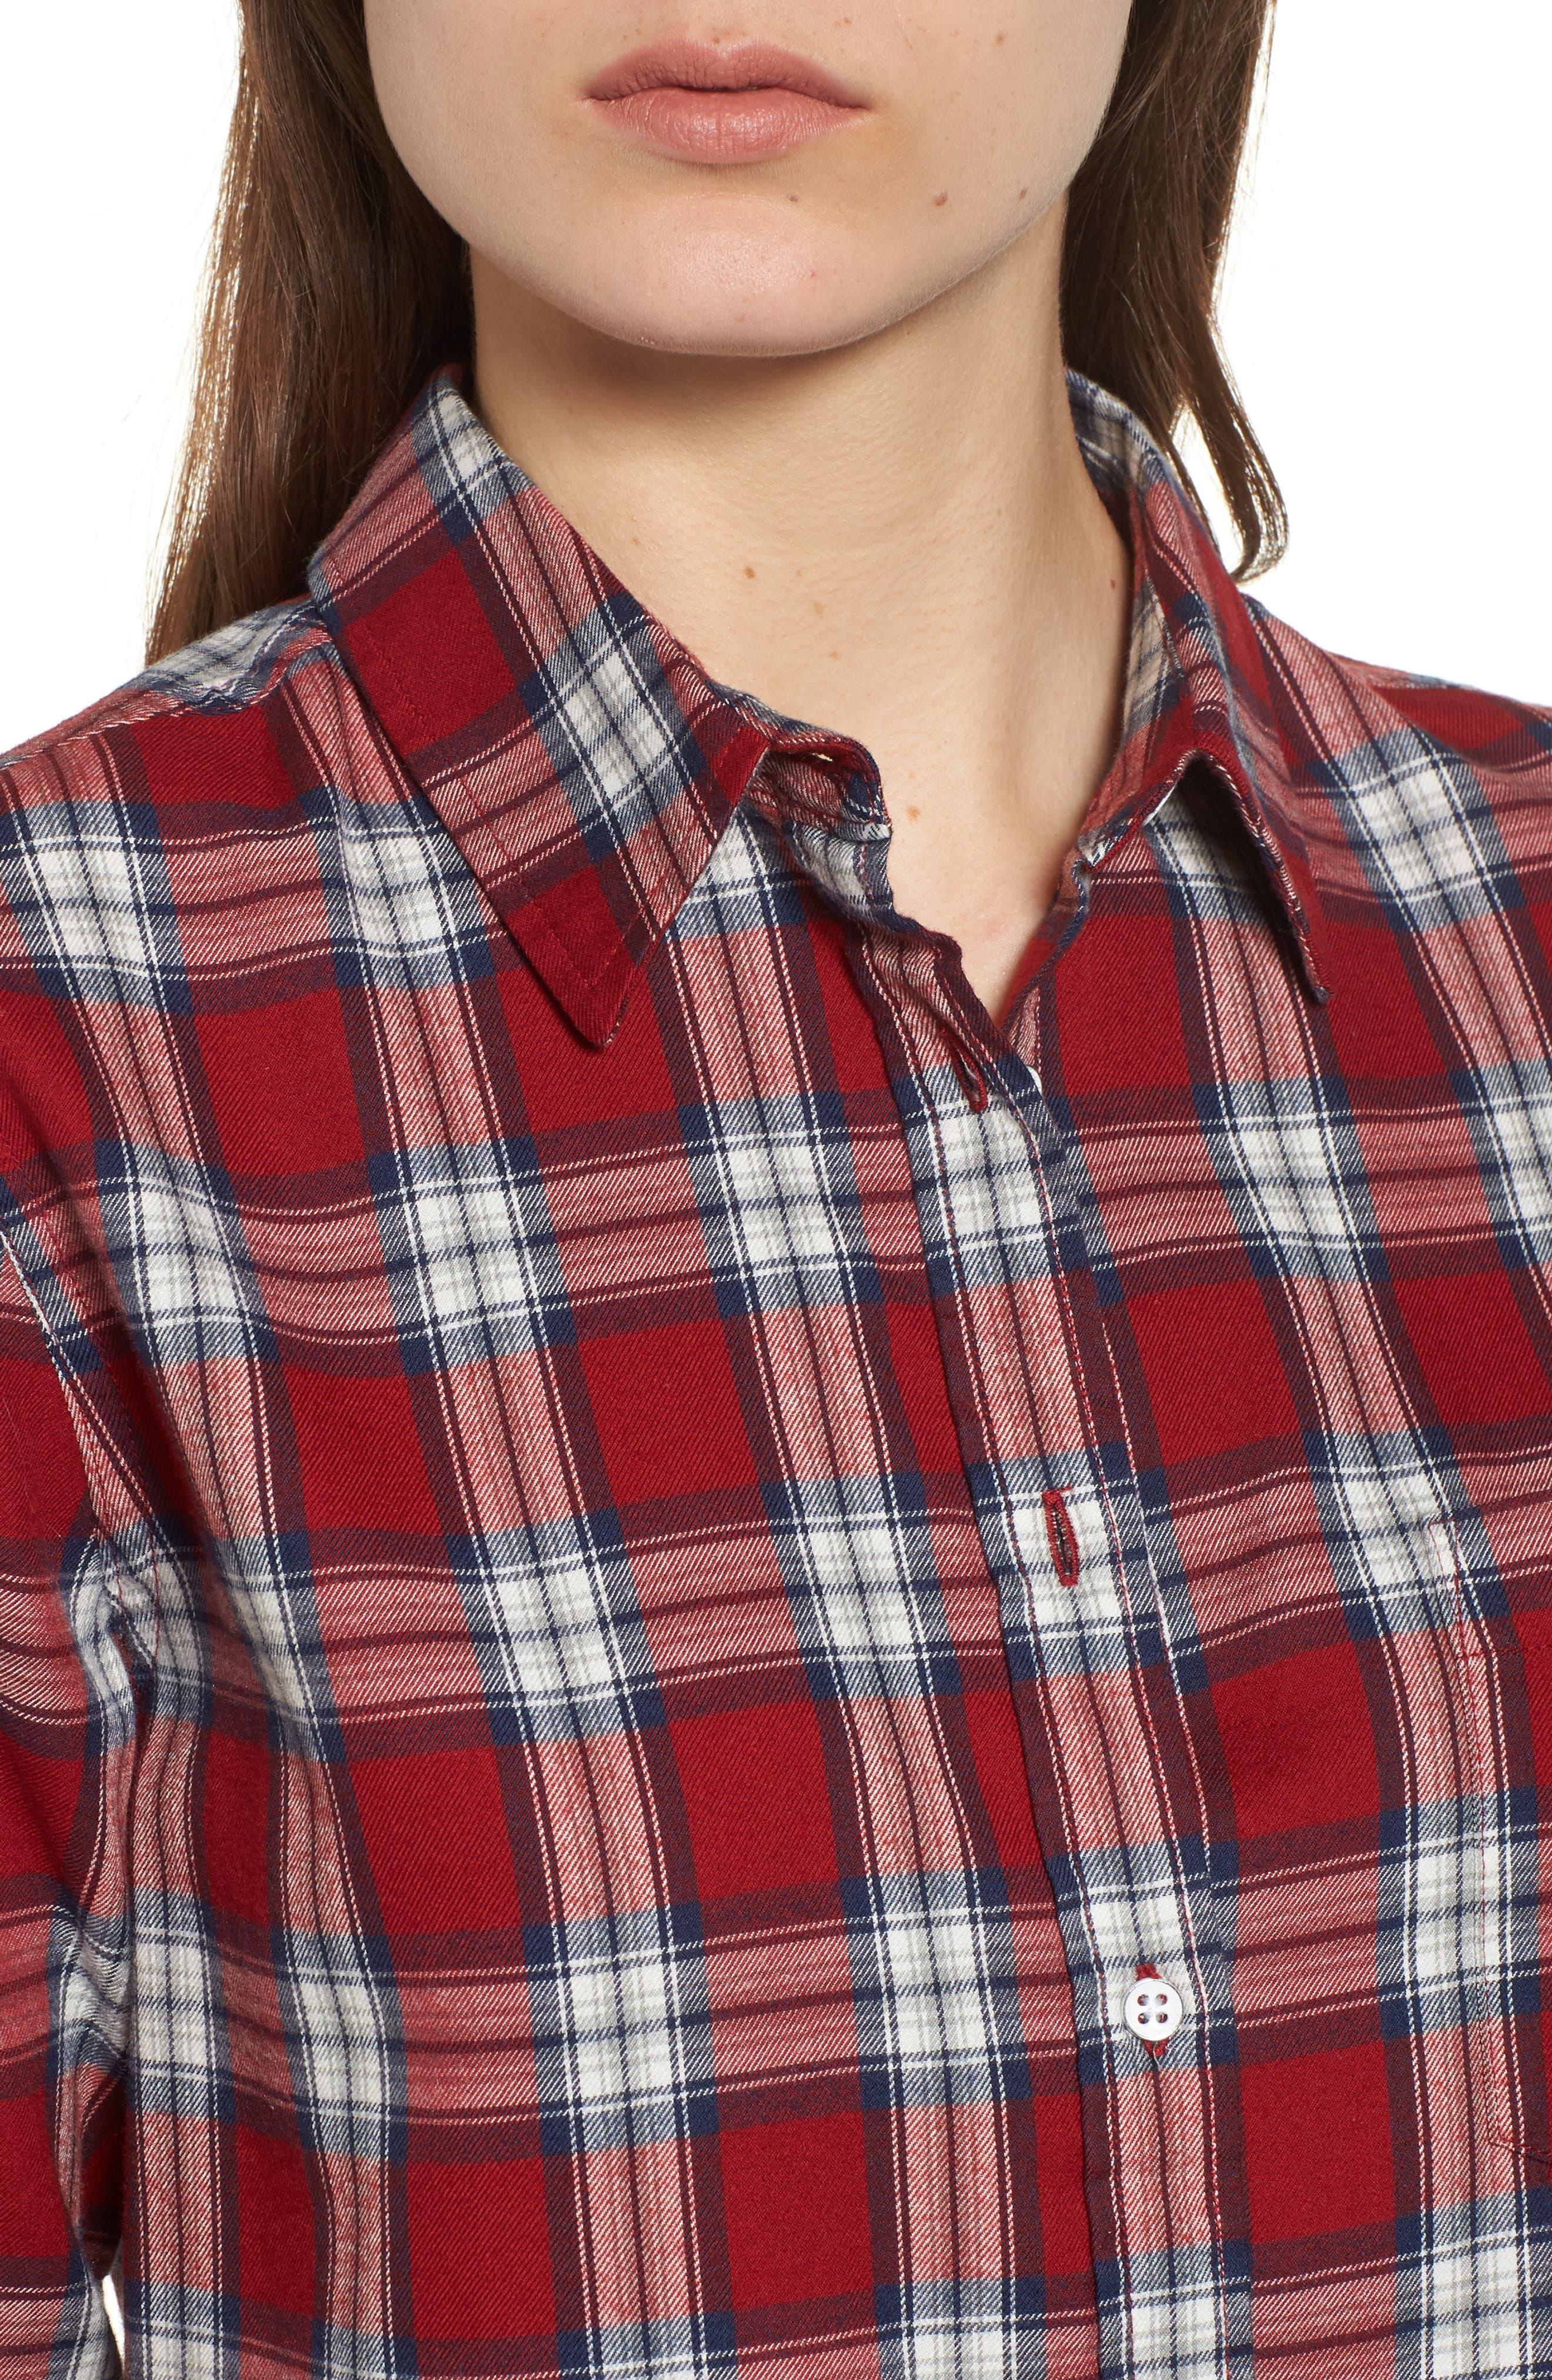 Mercer & Spring Plaid Shirt,                             Alternate thumbnail 4, color,                             Red Plaid